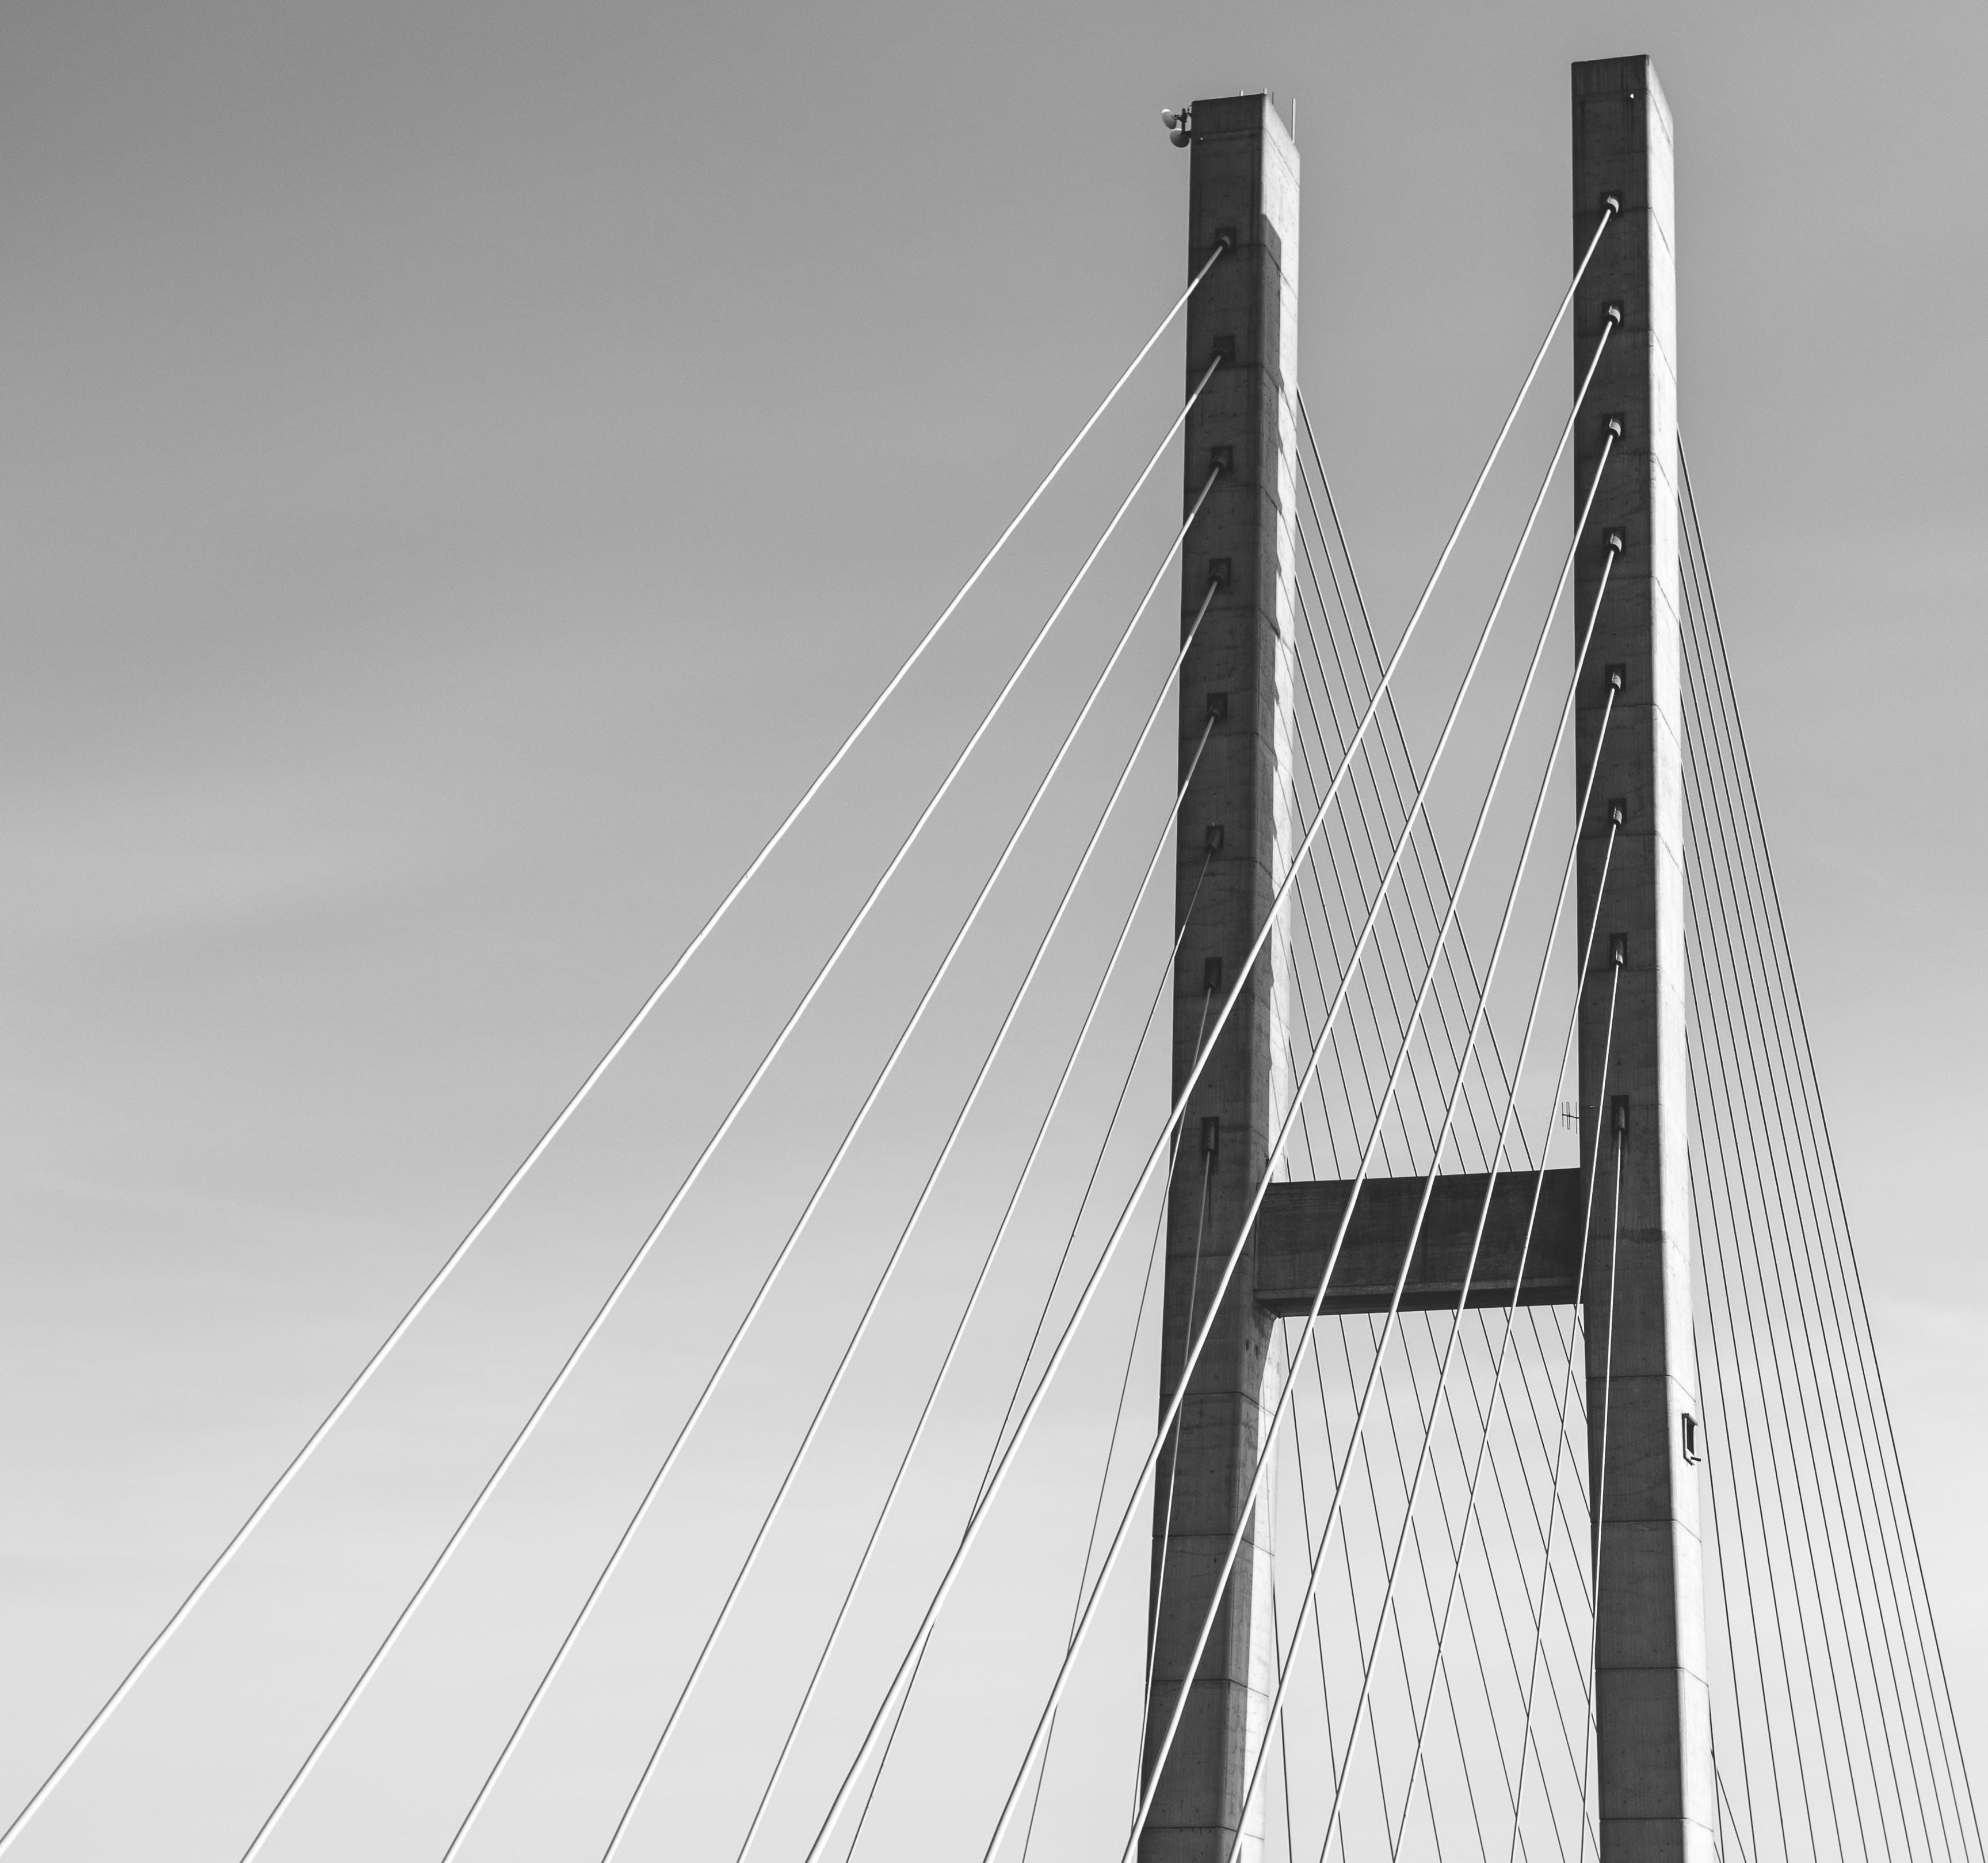 Gray Concrete Bridge in Grayscale Photography